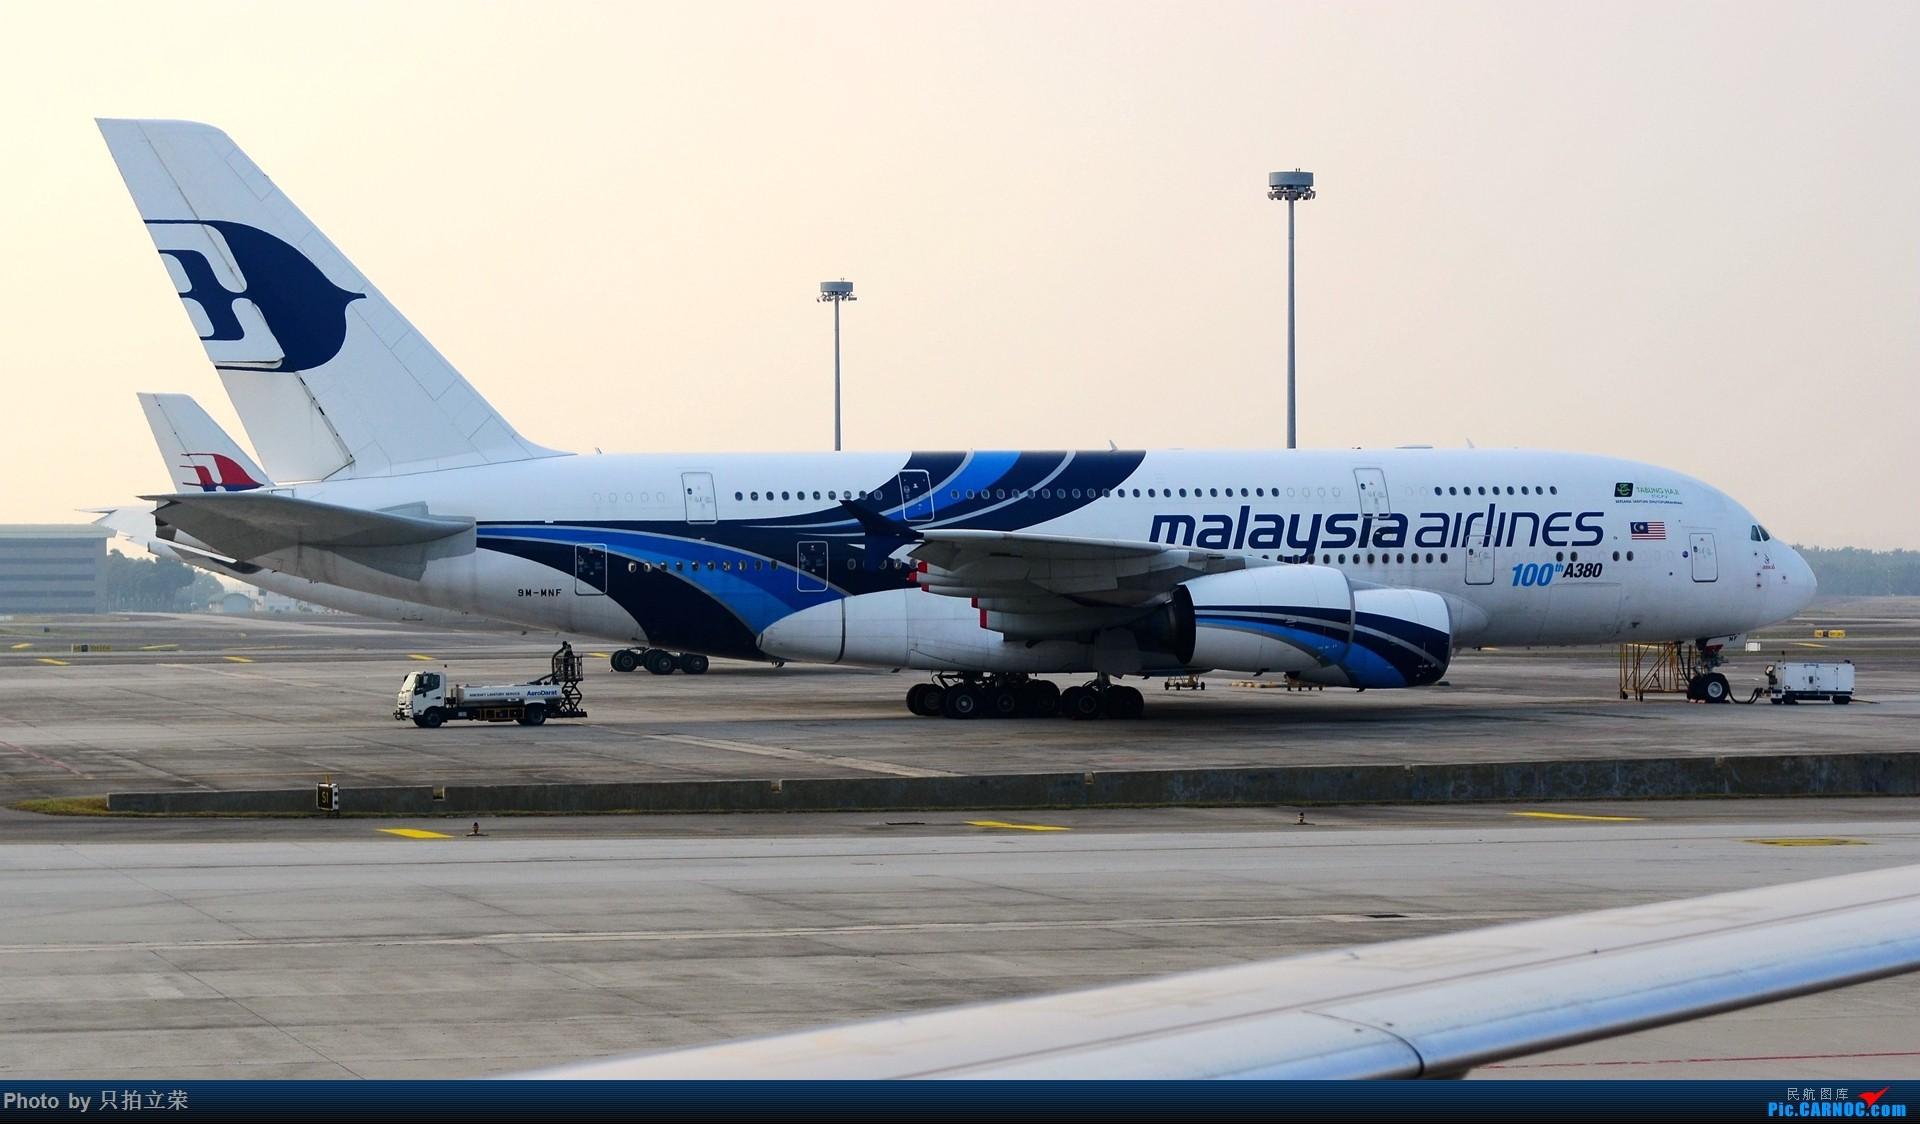 Re:[原创]湖南飞友会:只拍立荣回归。马来之旅航站楼杂图一堆。 AIRBUS A380-800 9M-MNF 马来西亚吉隆坡国际机场